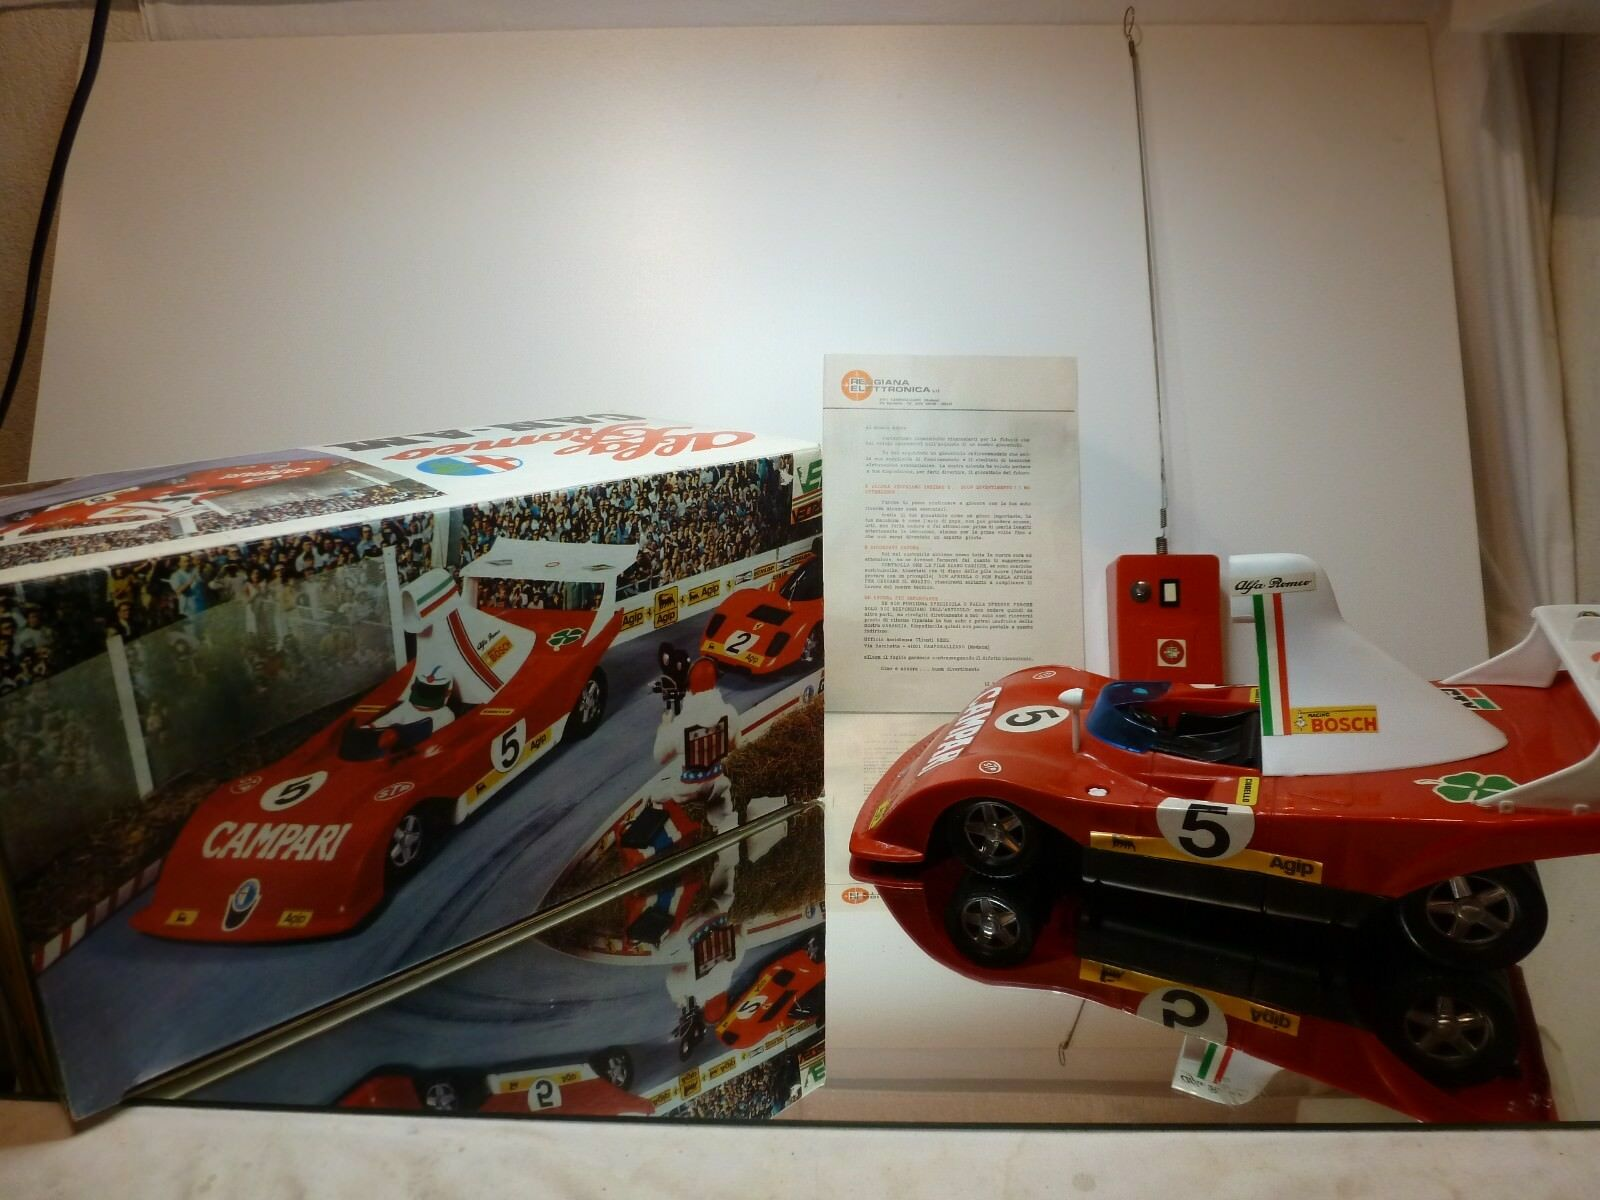 REEL ALFA ROMEO 33 TT 12 CAN AM - RED + WHITE L42.0cm - VERY GOOD IN BOX